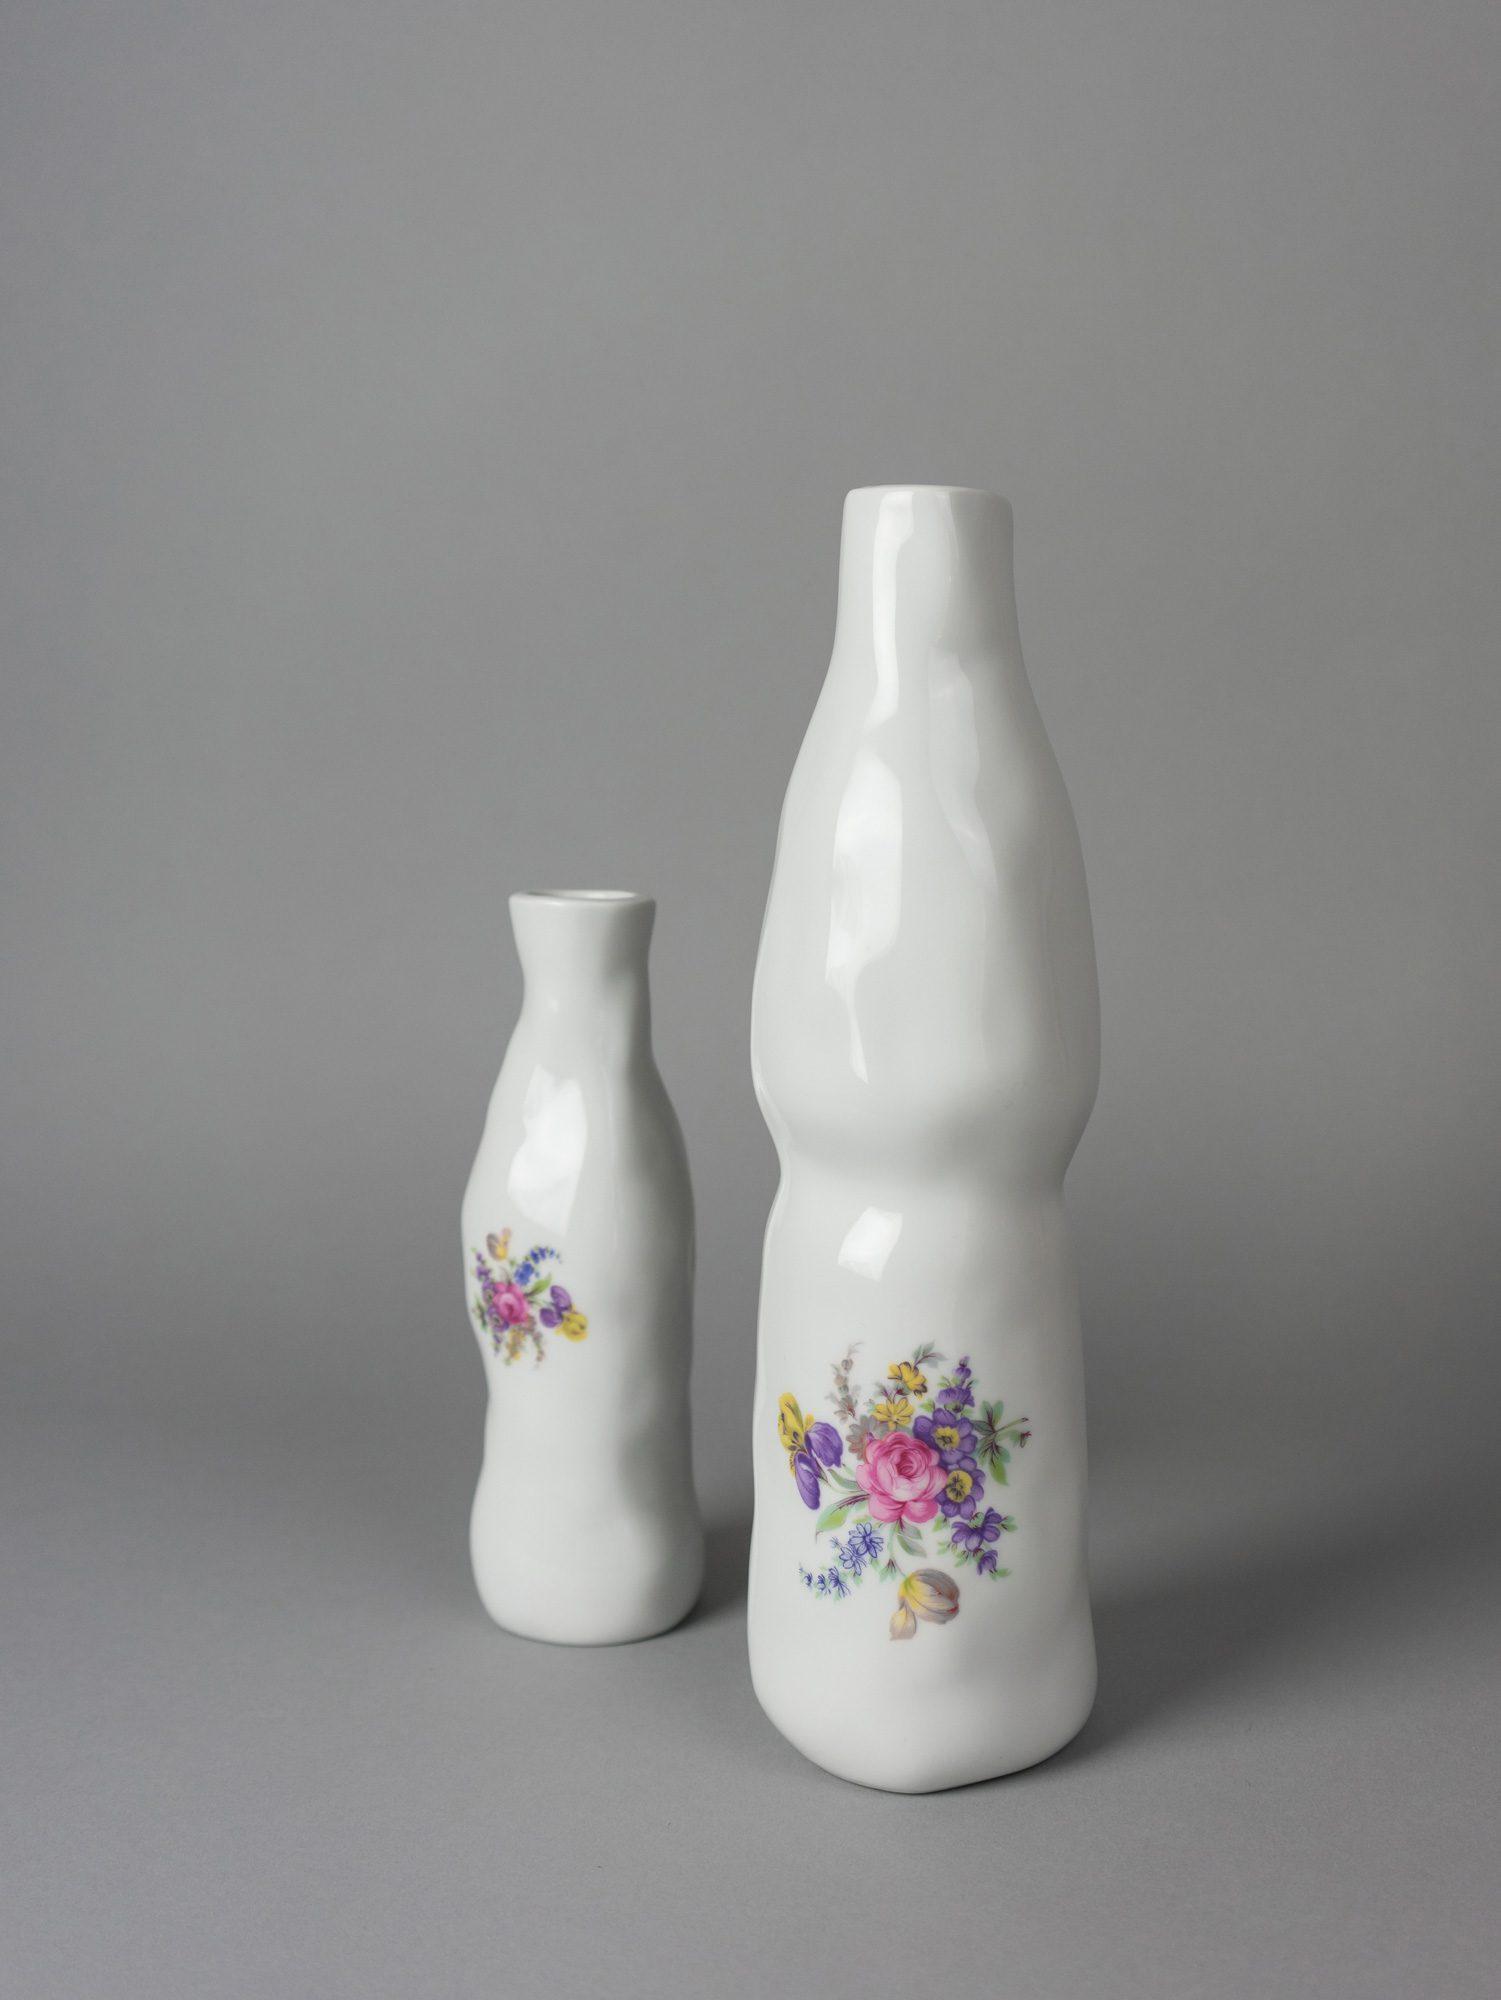 Two porcelain vases with floral prints by Qubus design studio